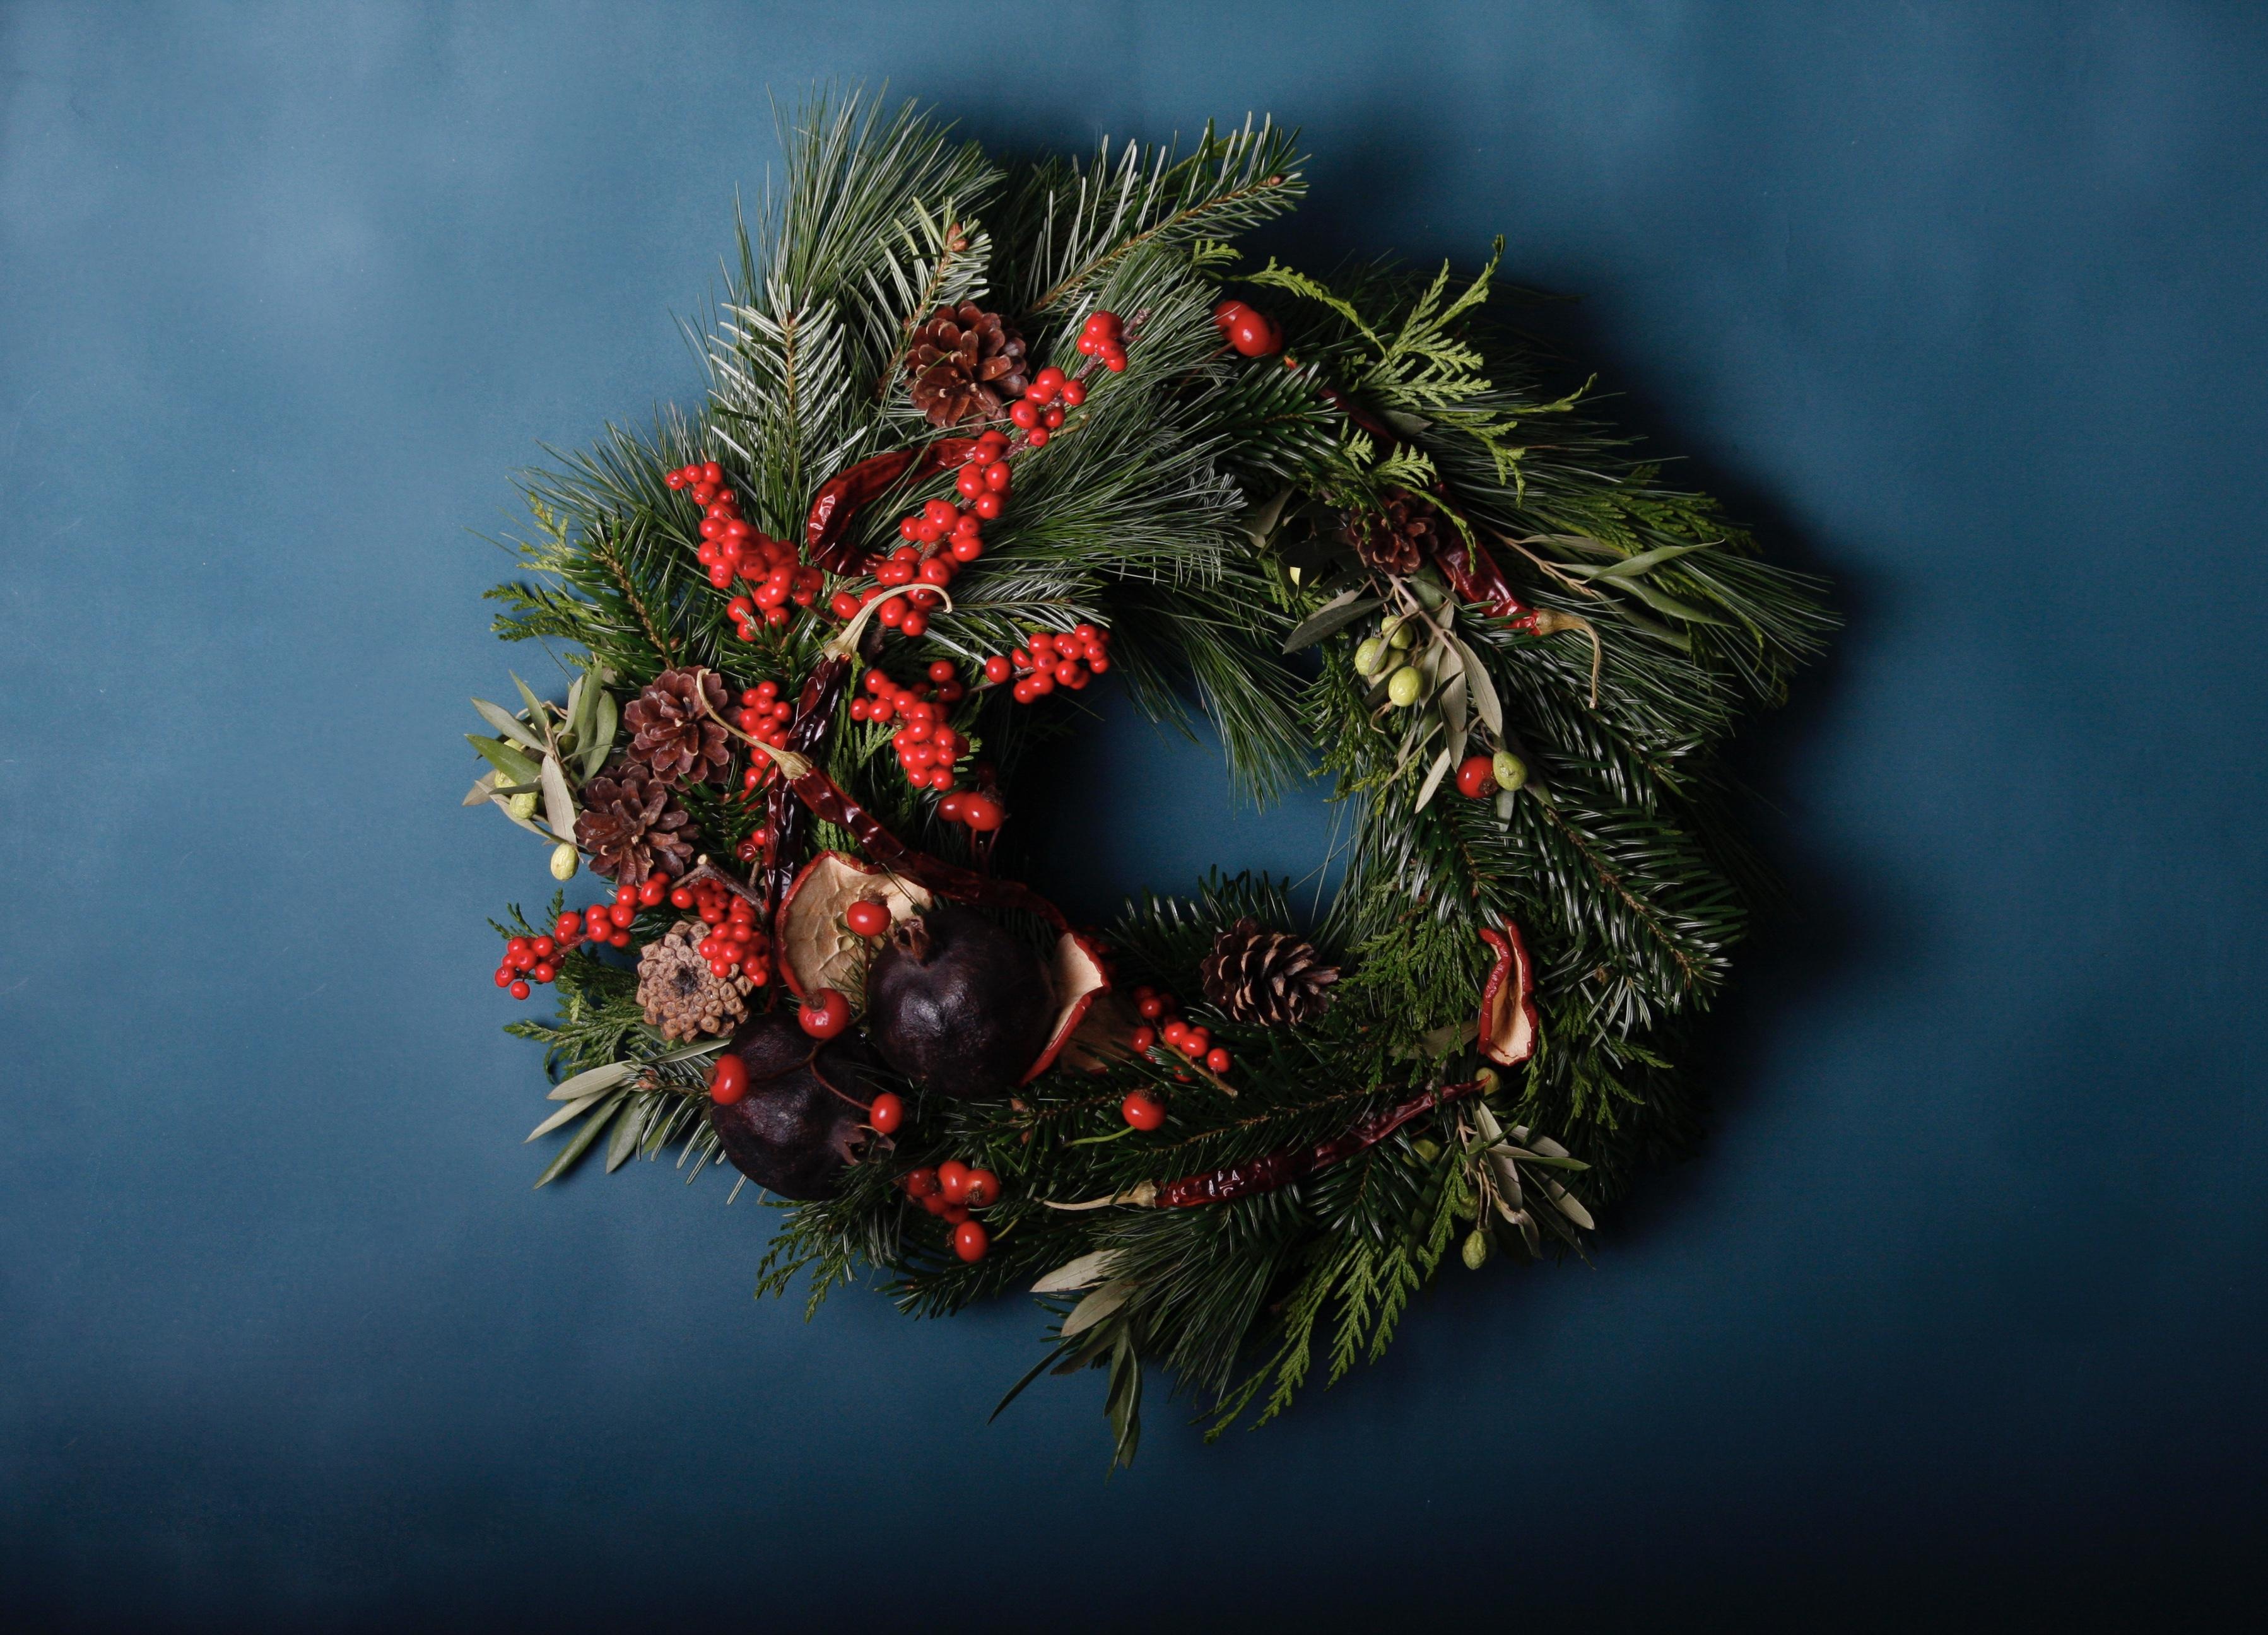 Wedding_Style_Magazine_Decoracion_de_Navidad_Savia_Bruta_floristeria_Madrid18052